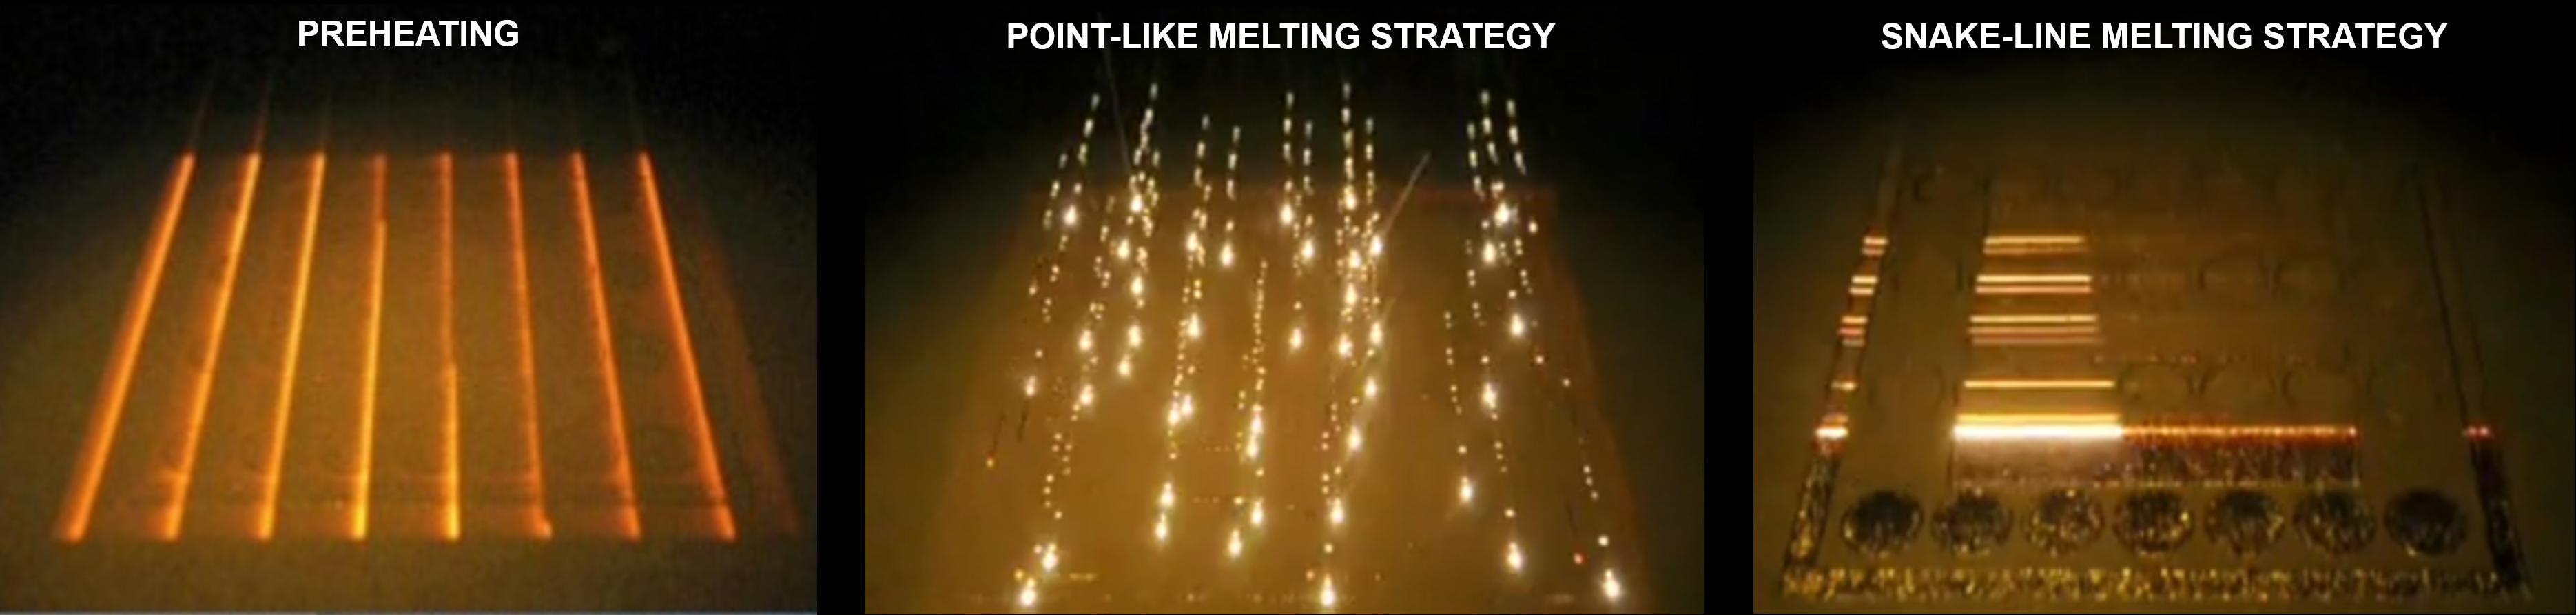 Melting strategies